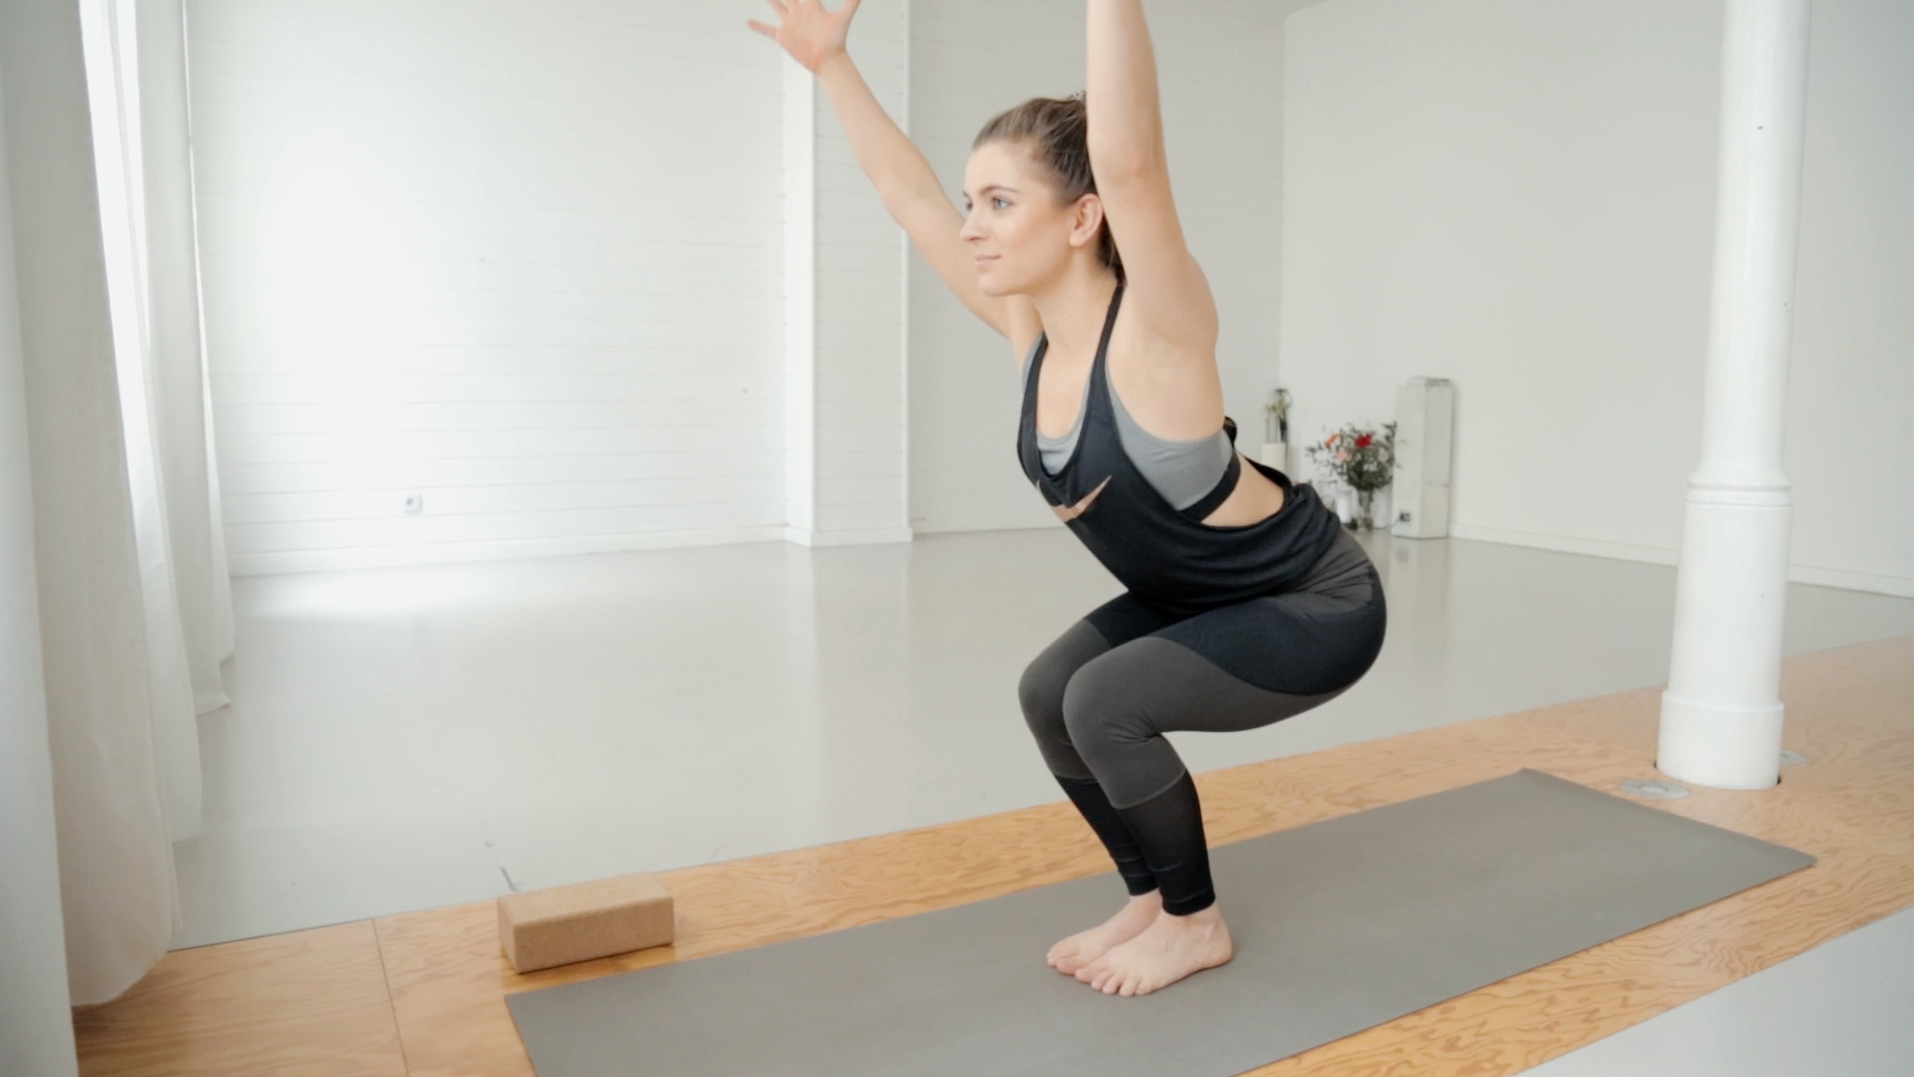 beine-po-booty-yoga-mady-morrison-09